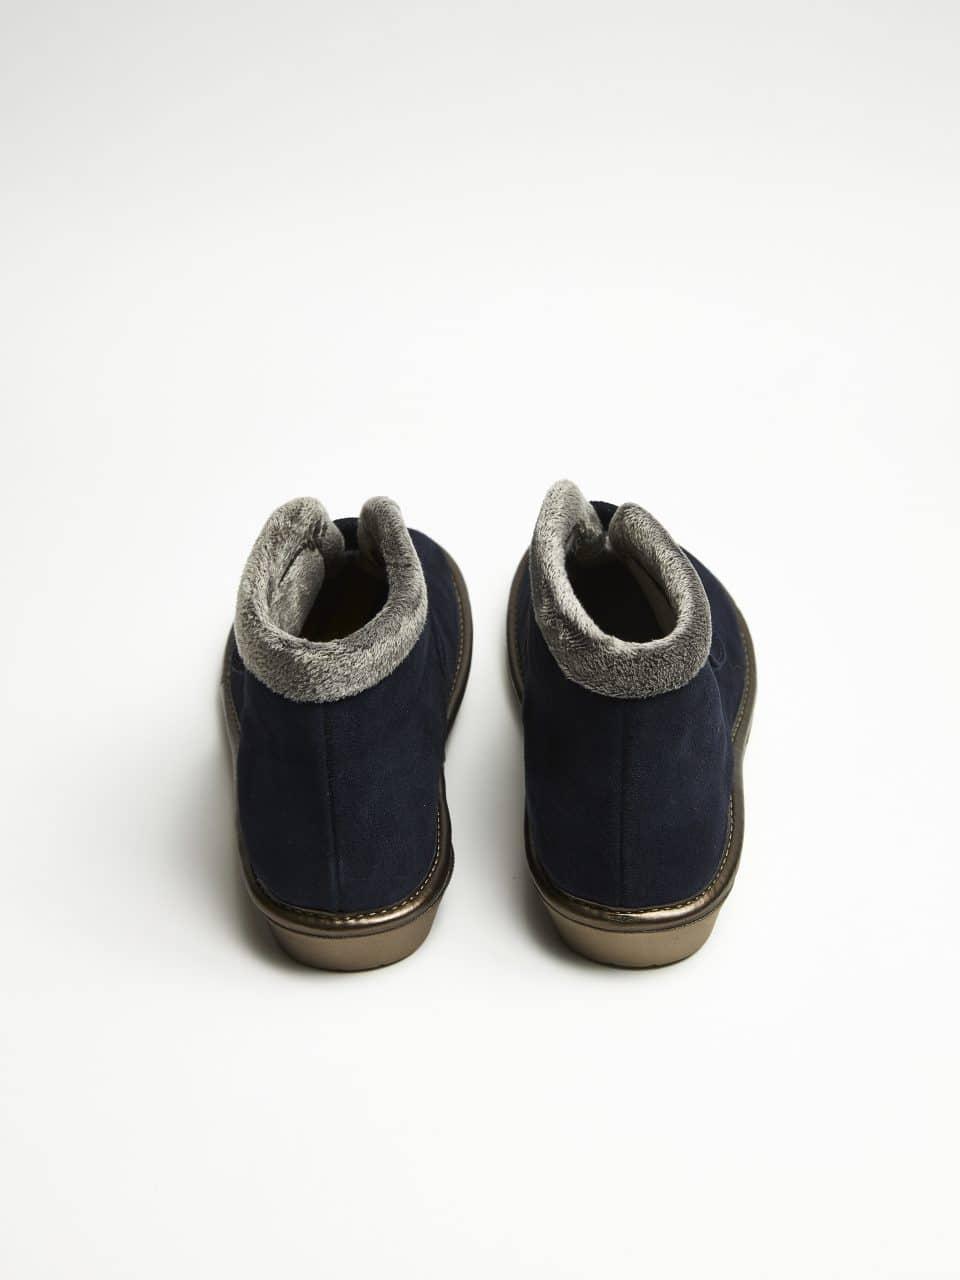 NORDIKAS BOTIN MUJER AFELPADO MARINO Marcas en Loyna Shoes